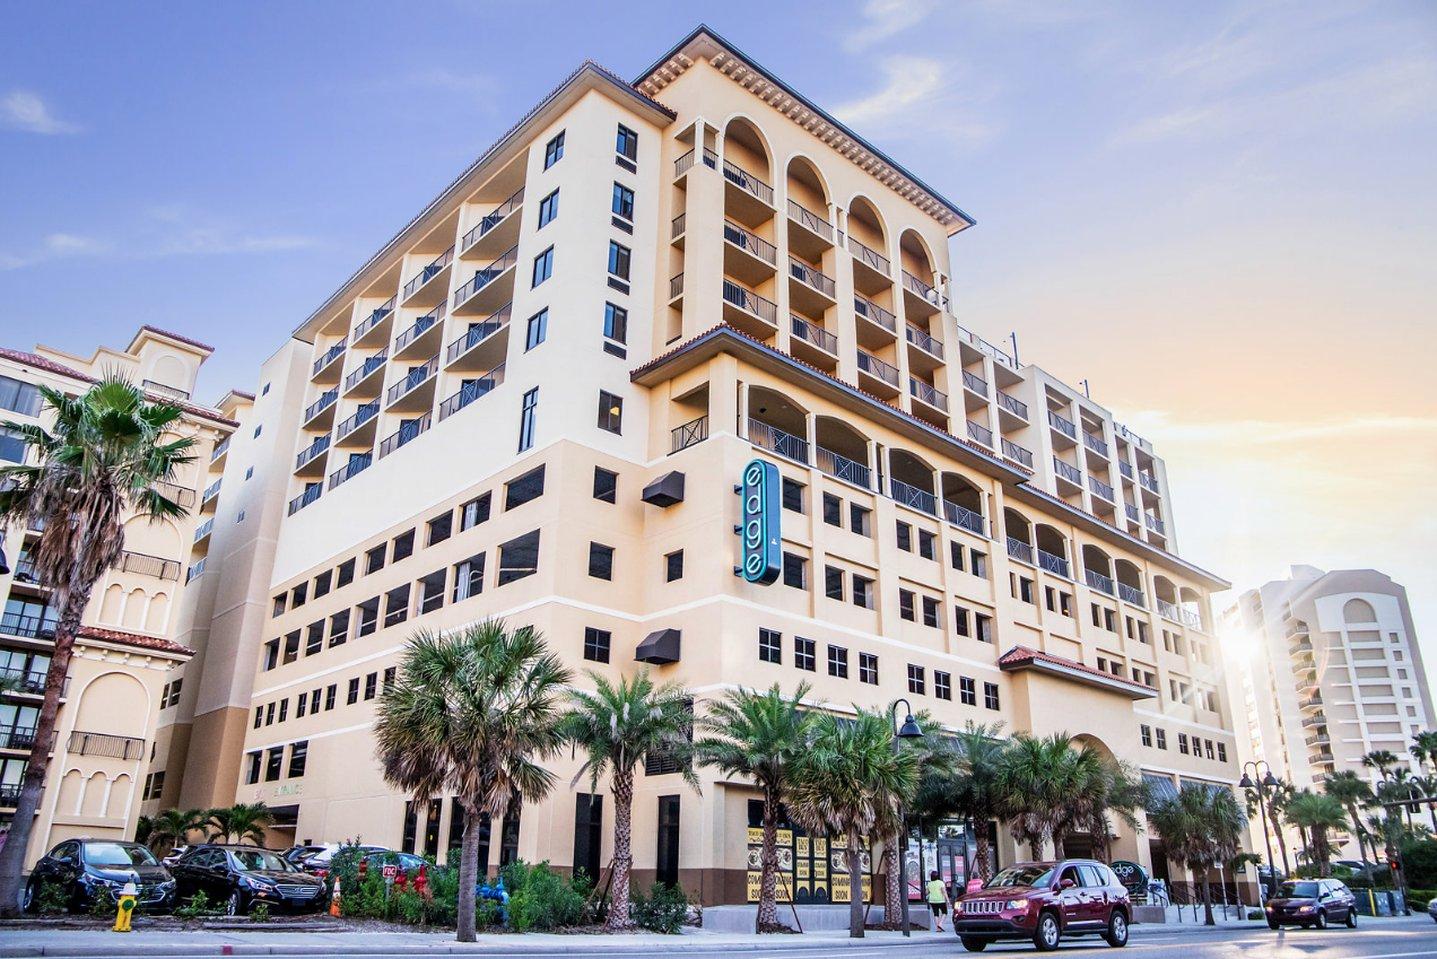 Hotel In Clearwater Beach Fl | Edge Hotel Clearwater Beach - Clearwater Beach Florida Map Of Hotels